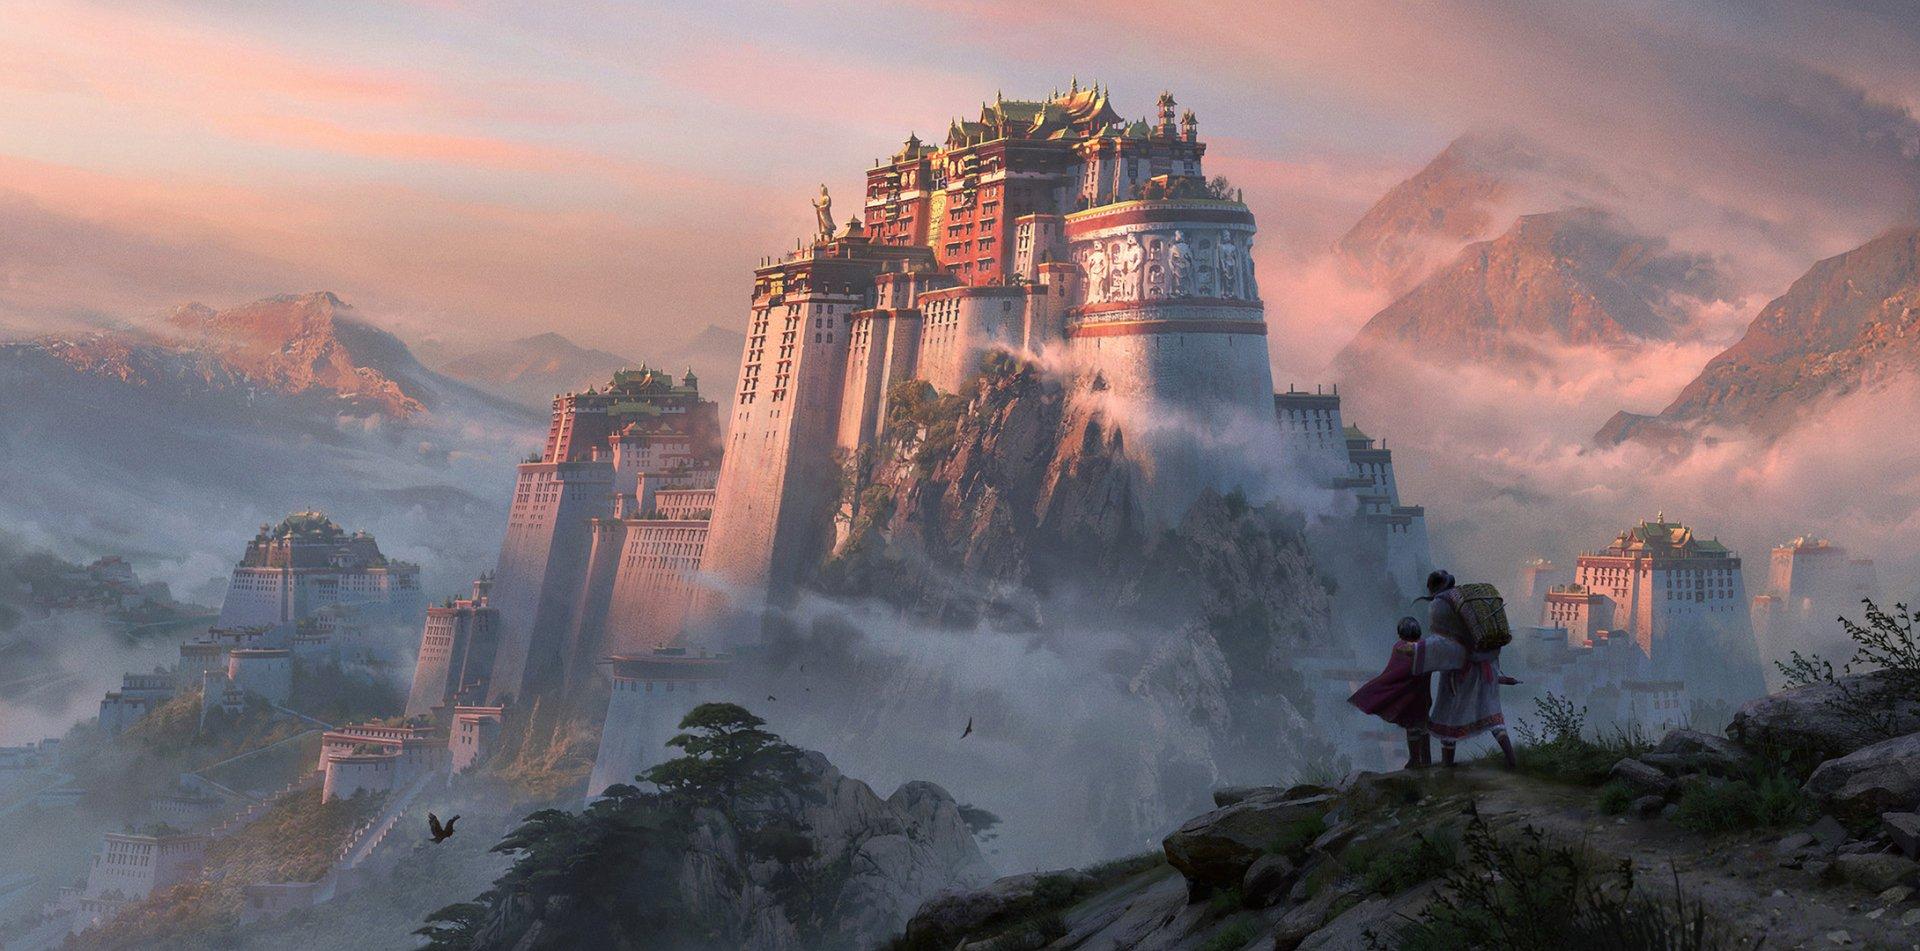 Fantasy - Castle  Wallpaper